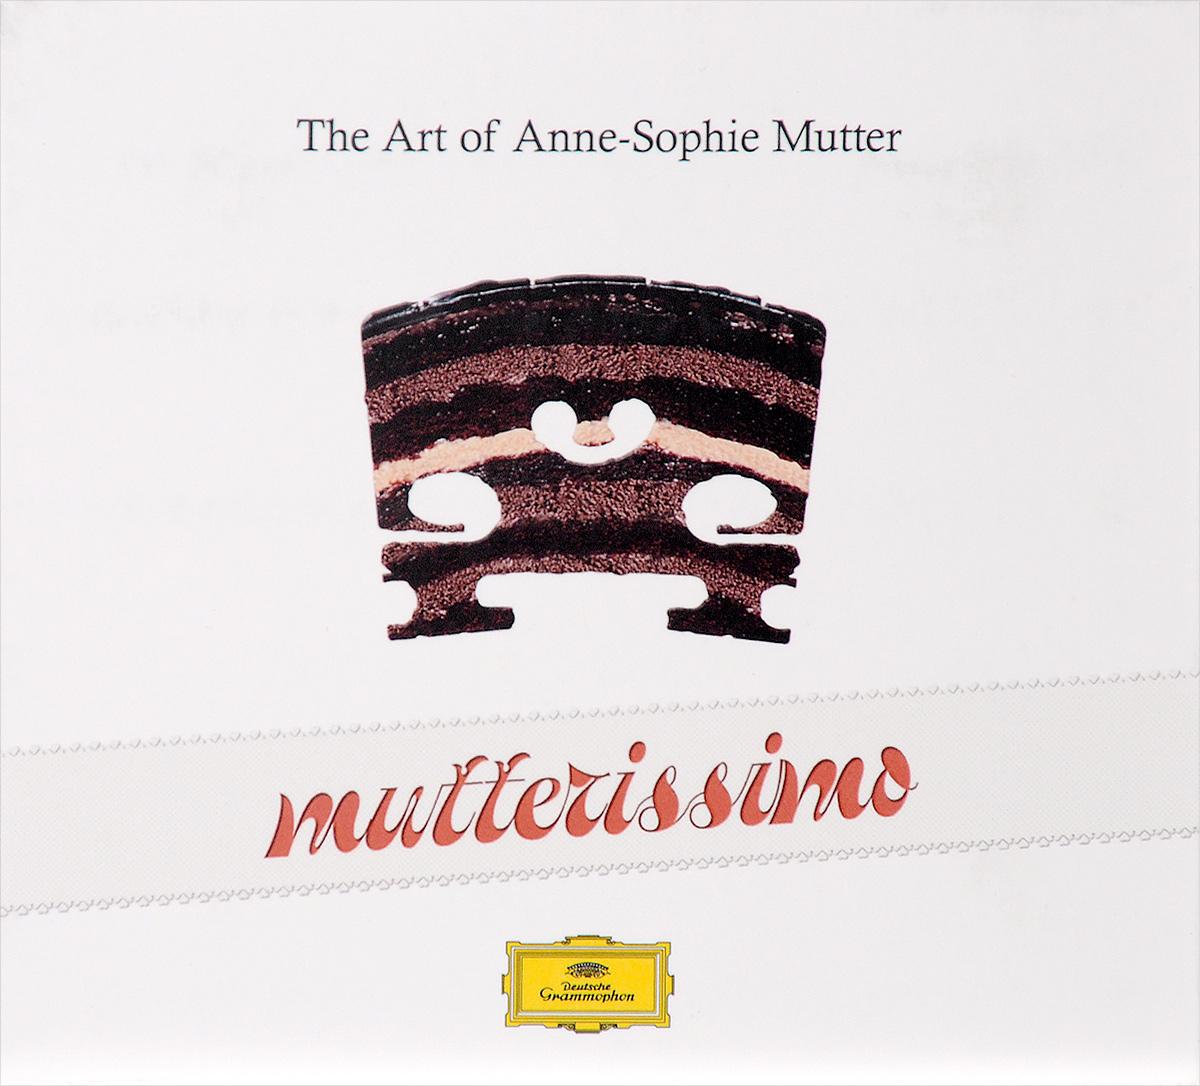 Анна-Софи Муттер Mutterissimo. The Art Of Anne-Sophie Mutter (2 CD) анна софи муттер ламберт оркис anne sophie mutter lambert orkis beethoven violin sonatas nos 5